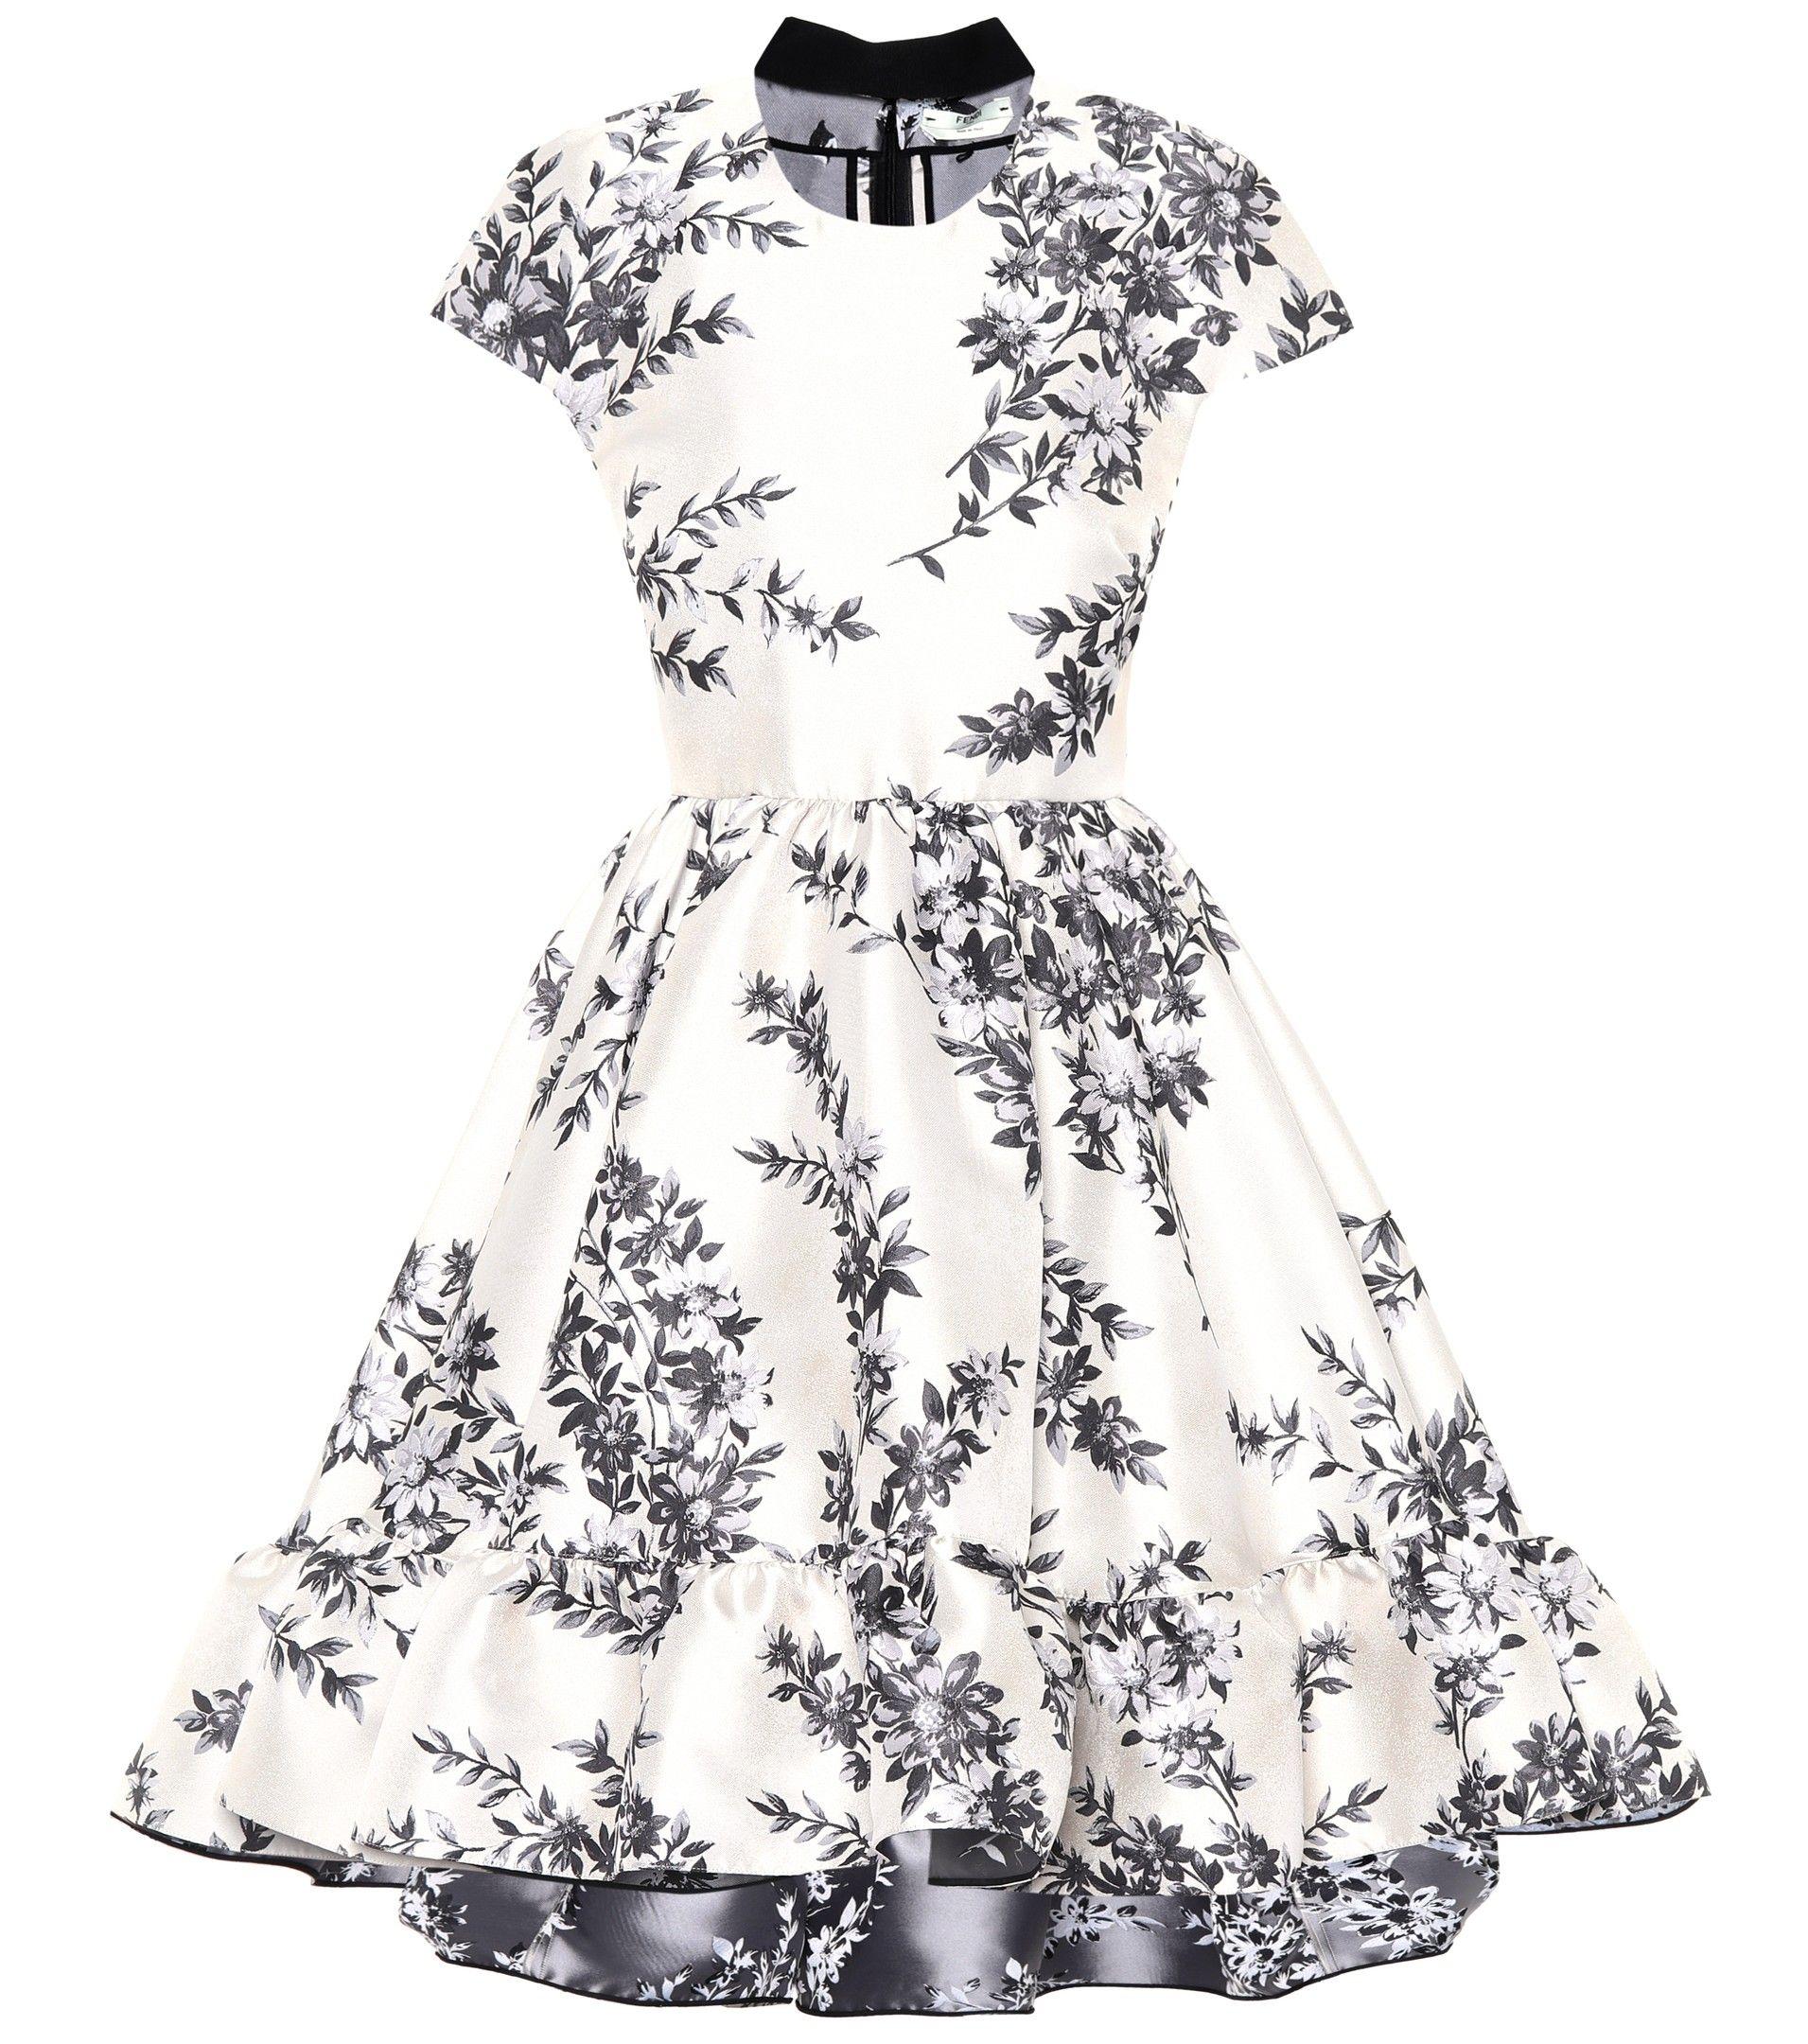 White Floral Brocade Dress Dresses Brocade Dresses Clothes Design [ 2160 x 1911 Pixel ]